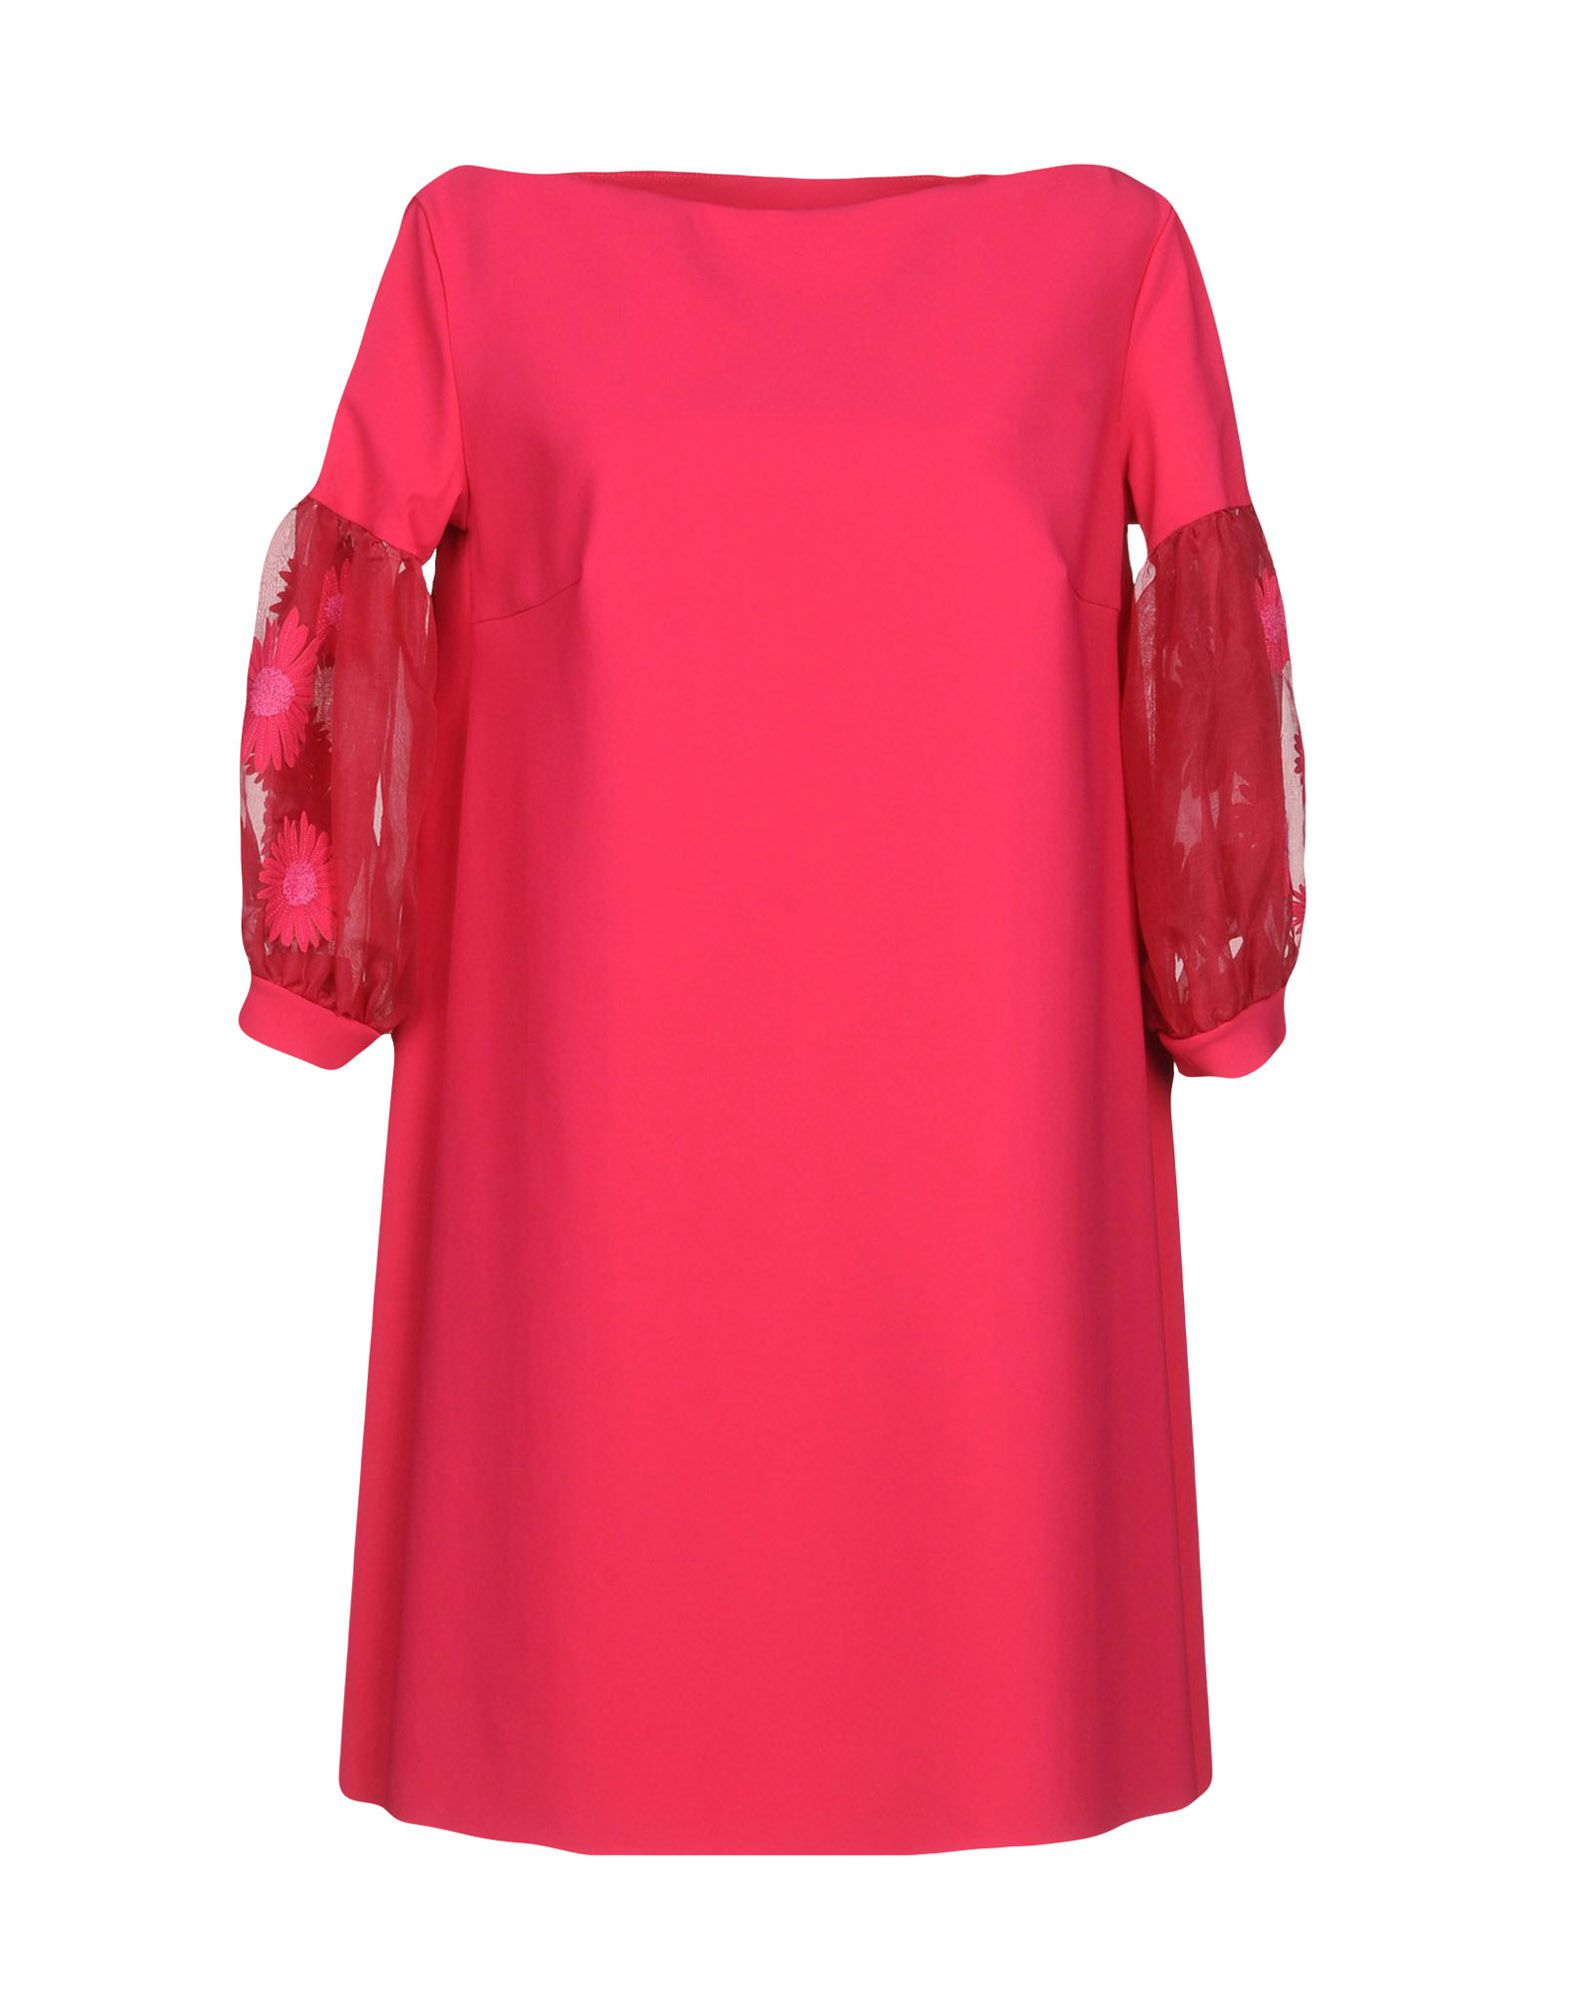 CHIARA BONI LA PETITE ROBE Короткое платье chiara boni la petite robe повседневные брюки